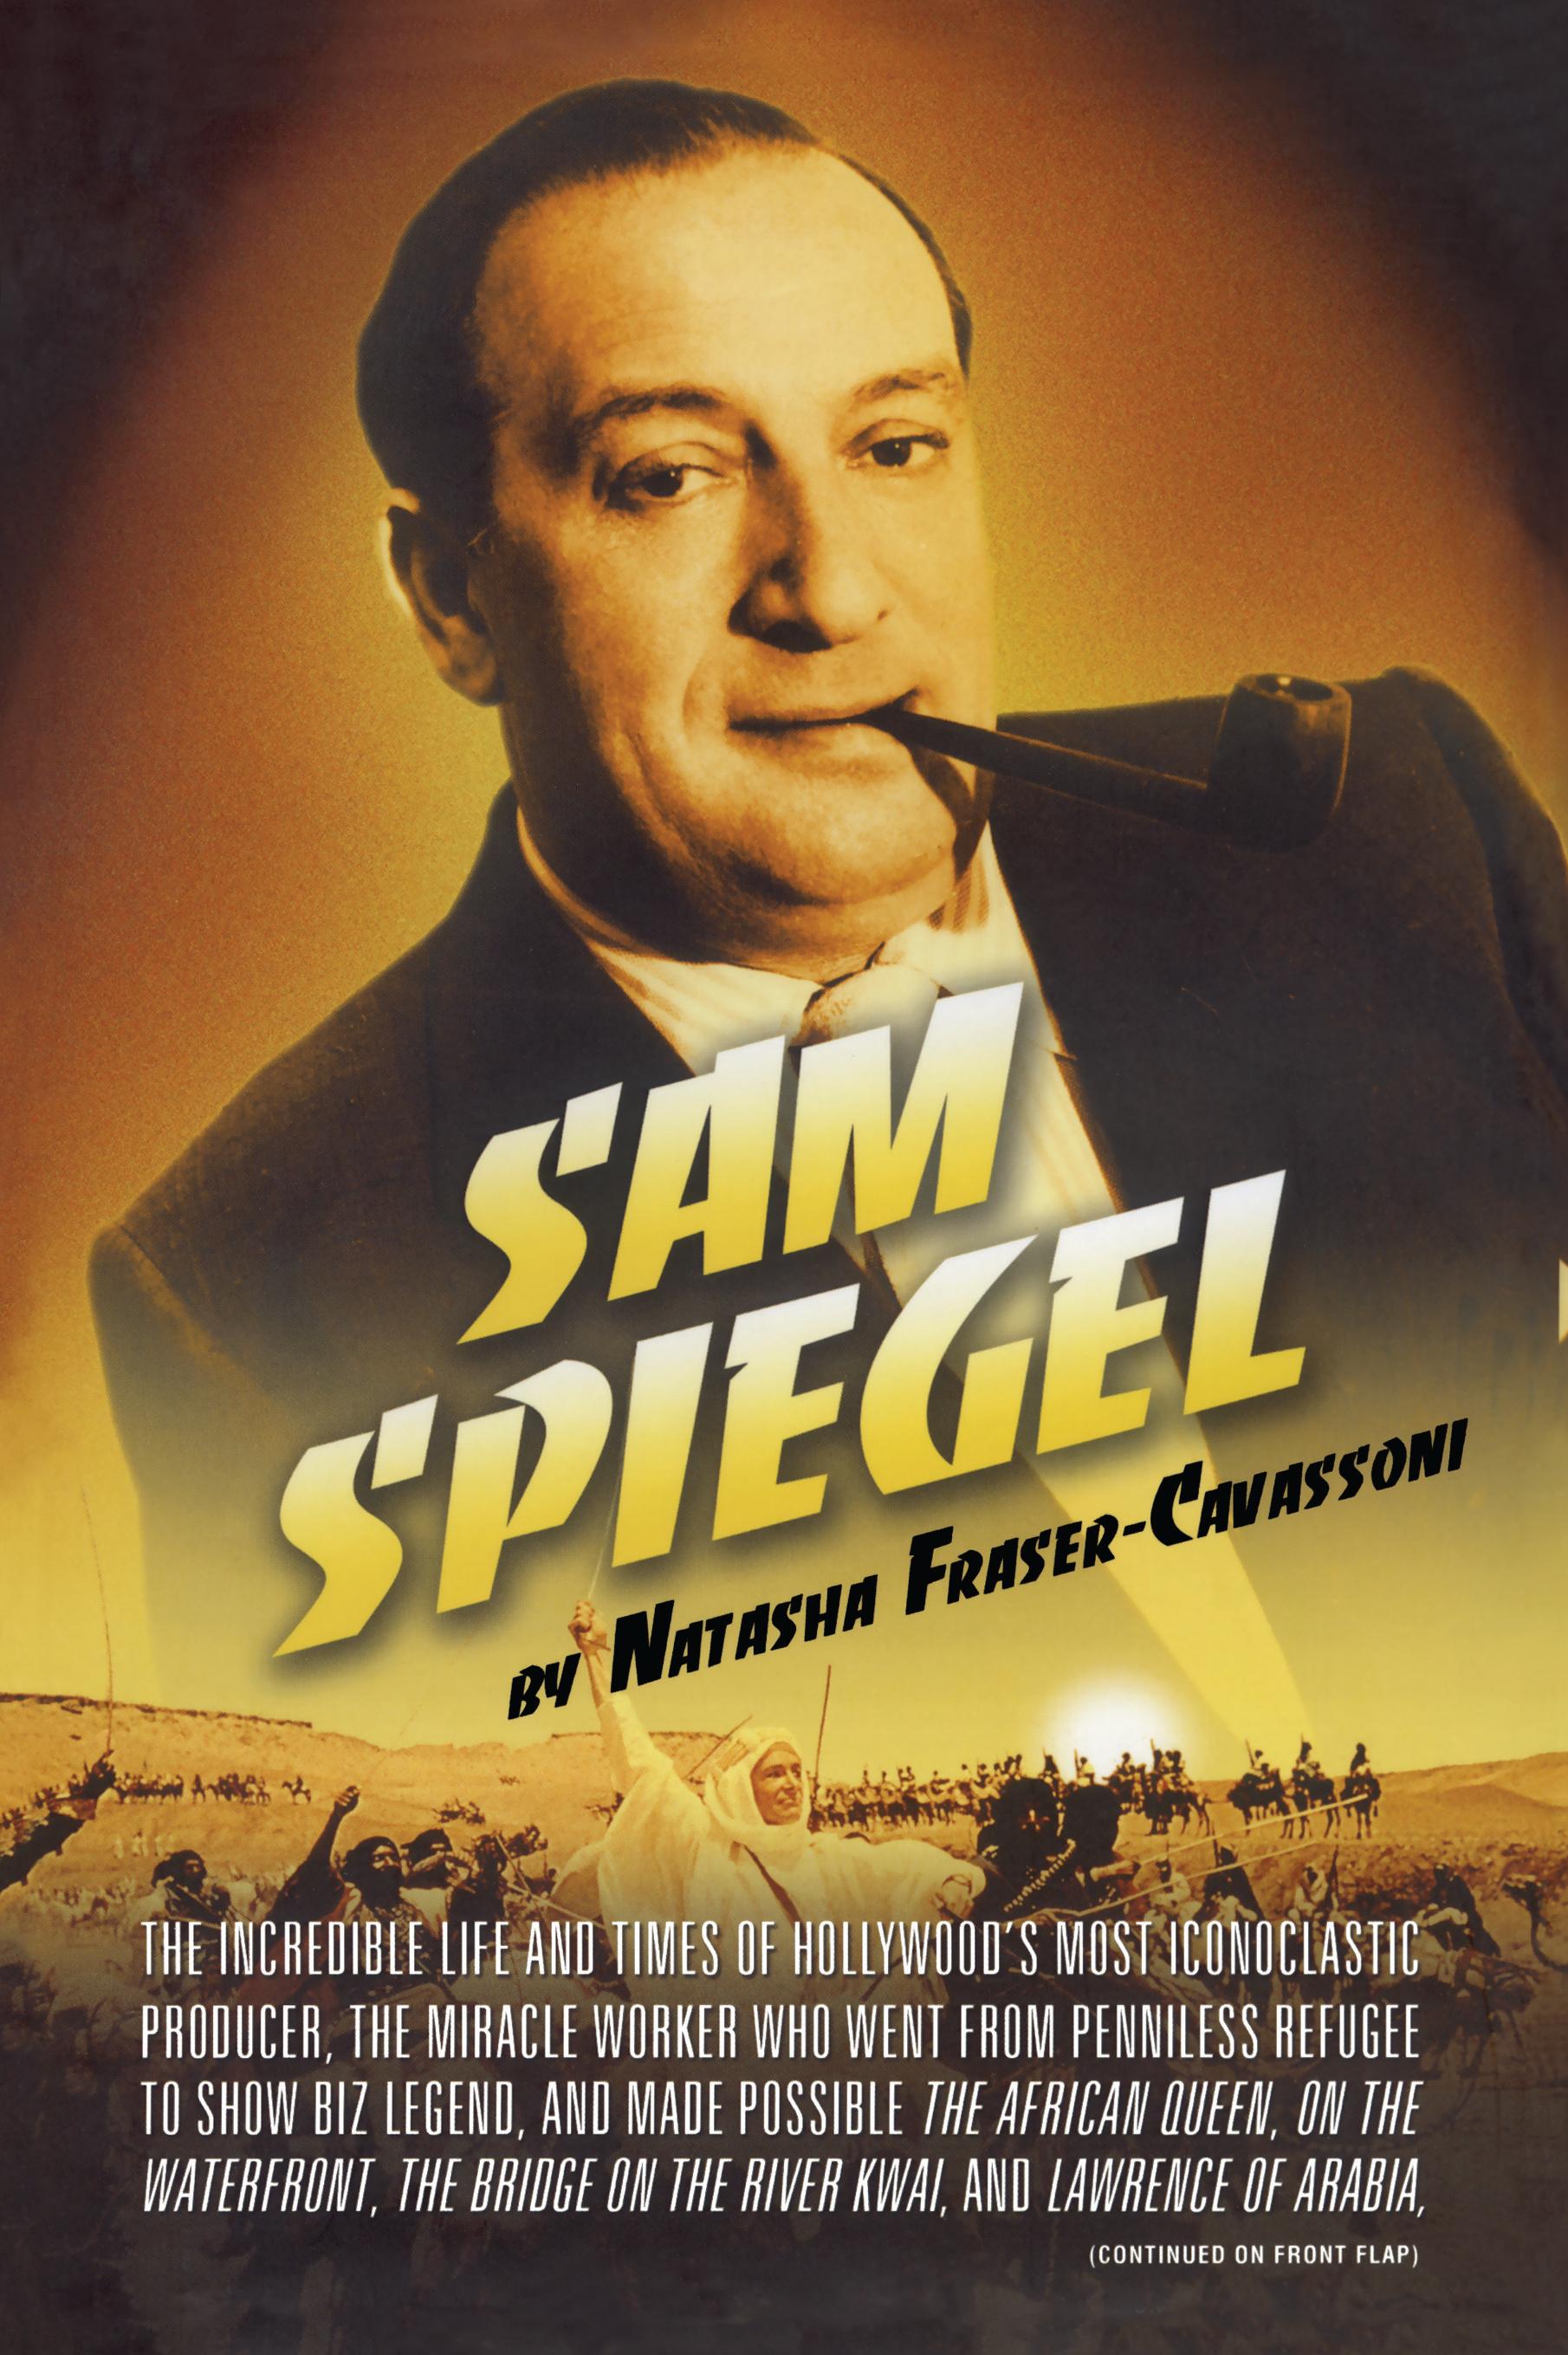 Book Cover Image (jpg): Sam Spiegel